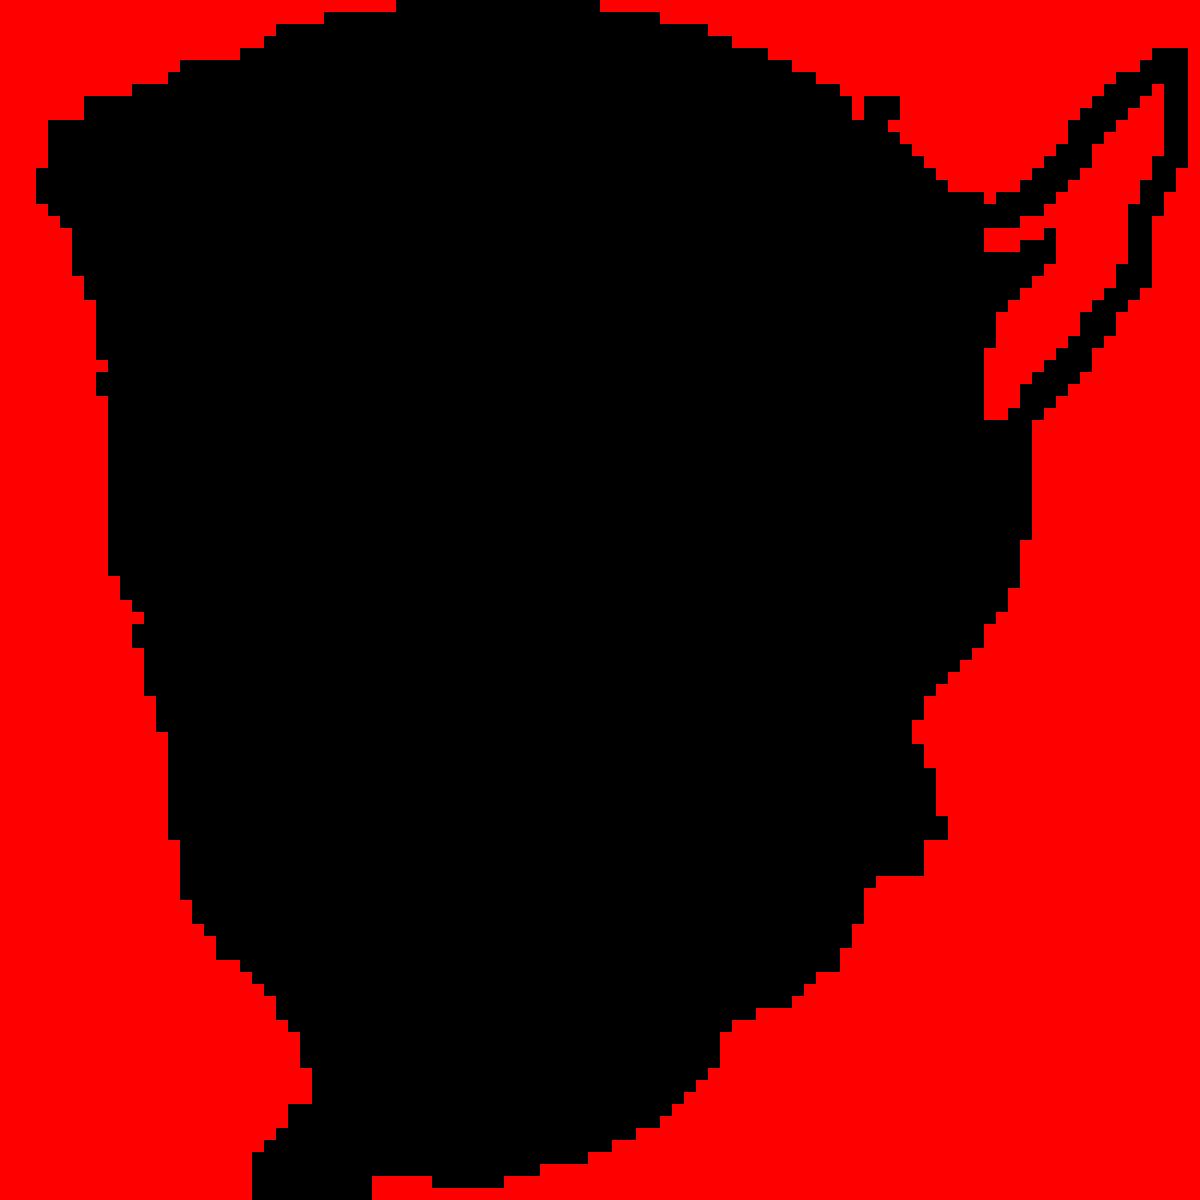 Pixilart Dodge Demon Logo By Tornadolucas777